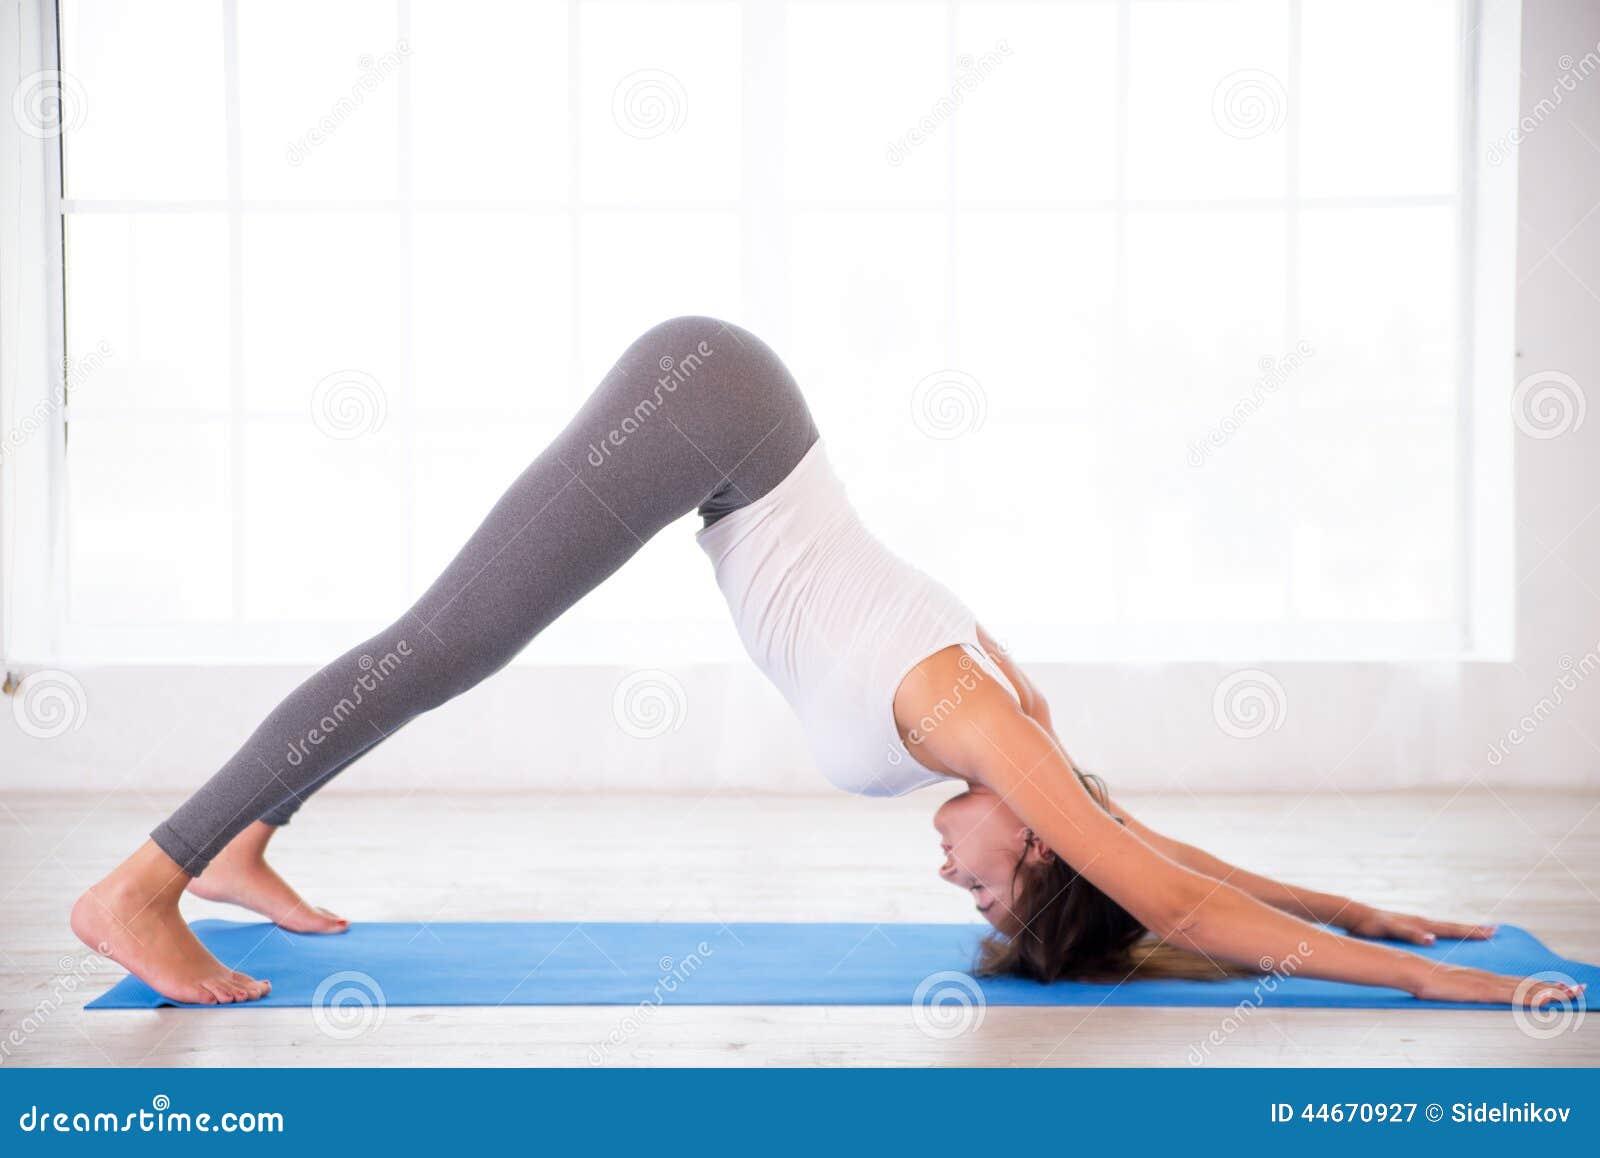 Yoga Woman Doing Down Dog Pose Stock Image   Image of indoors ...